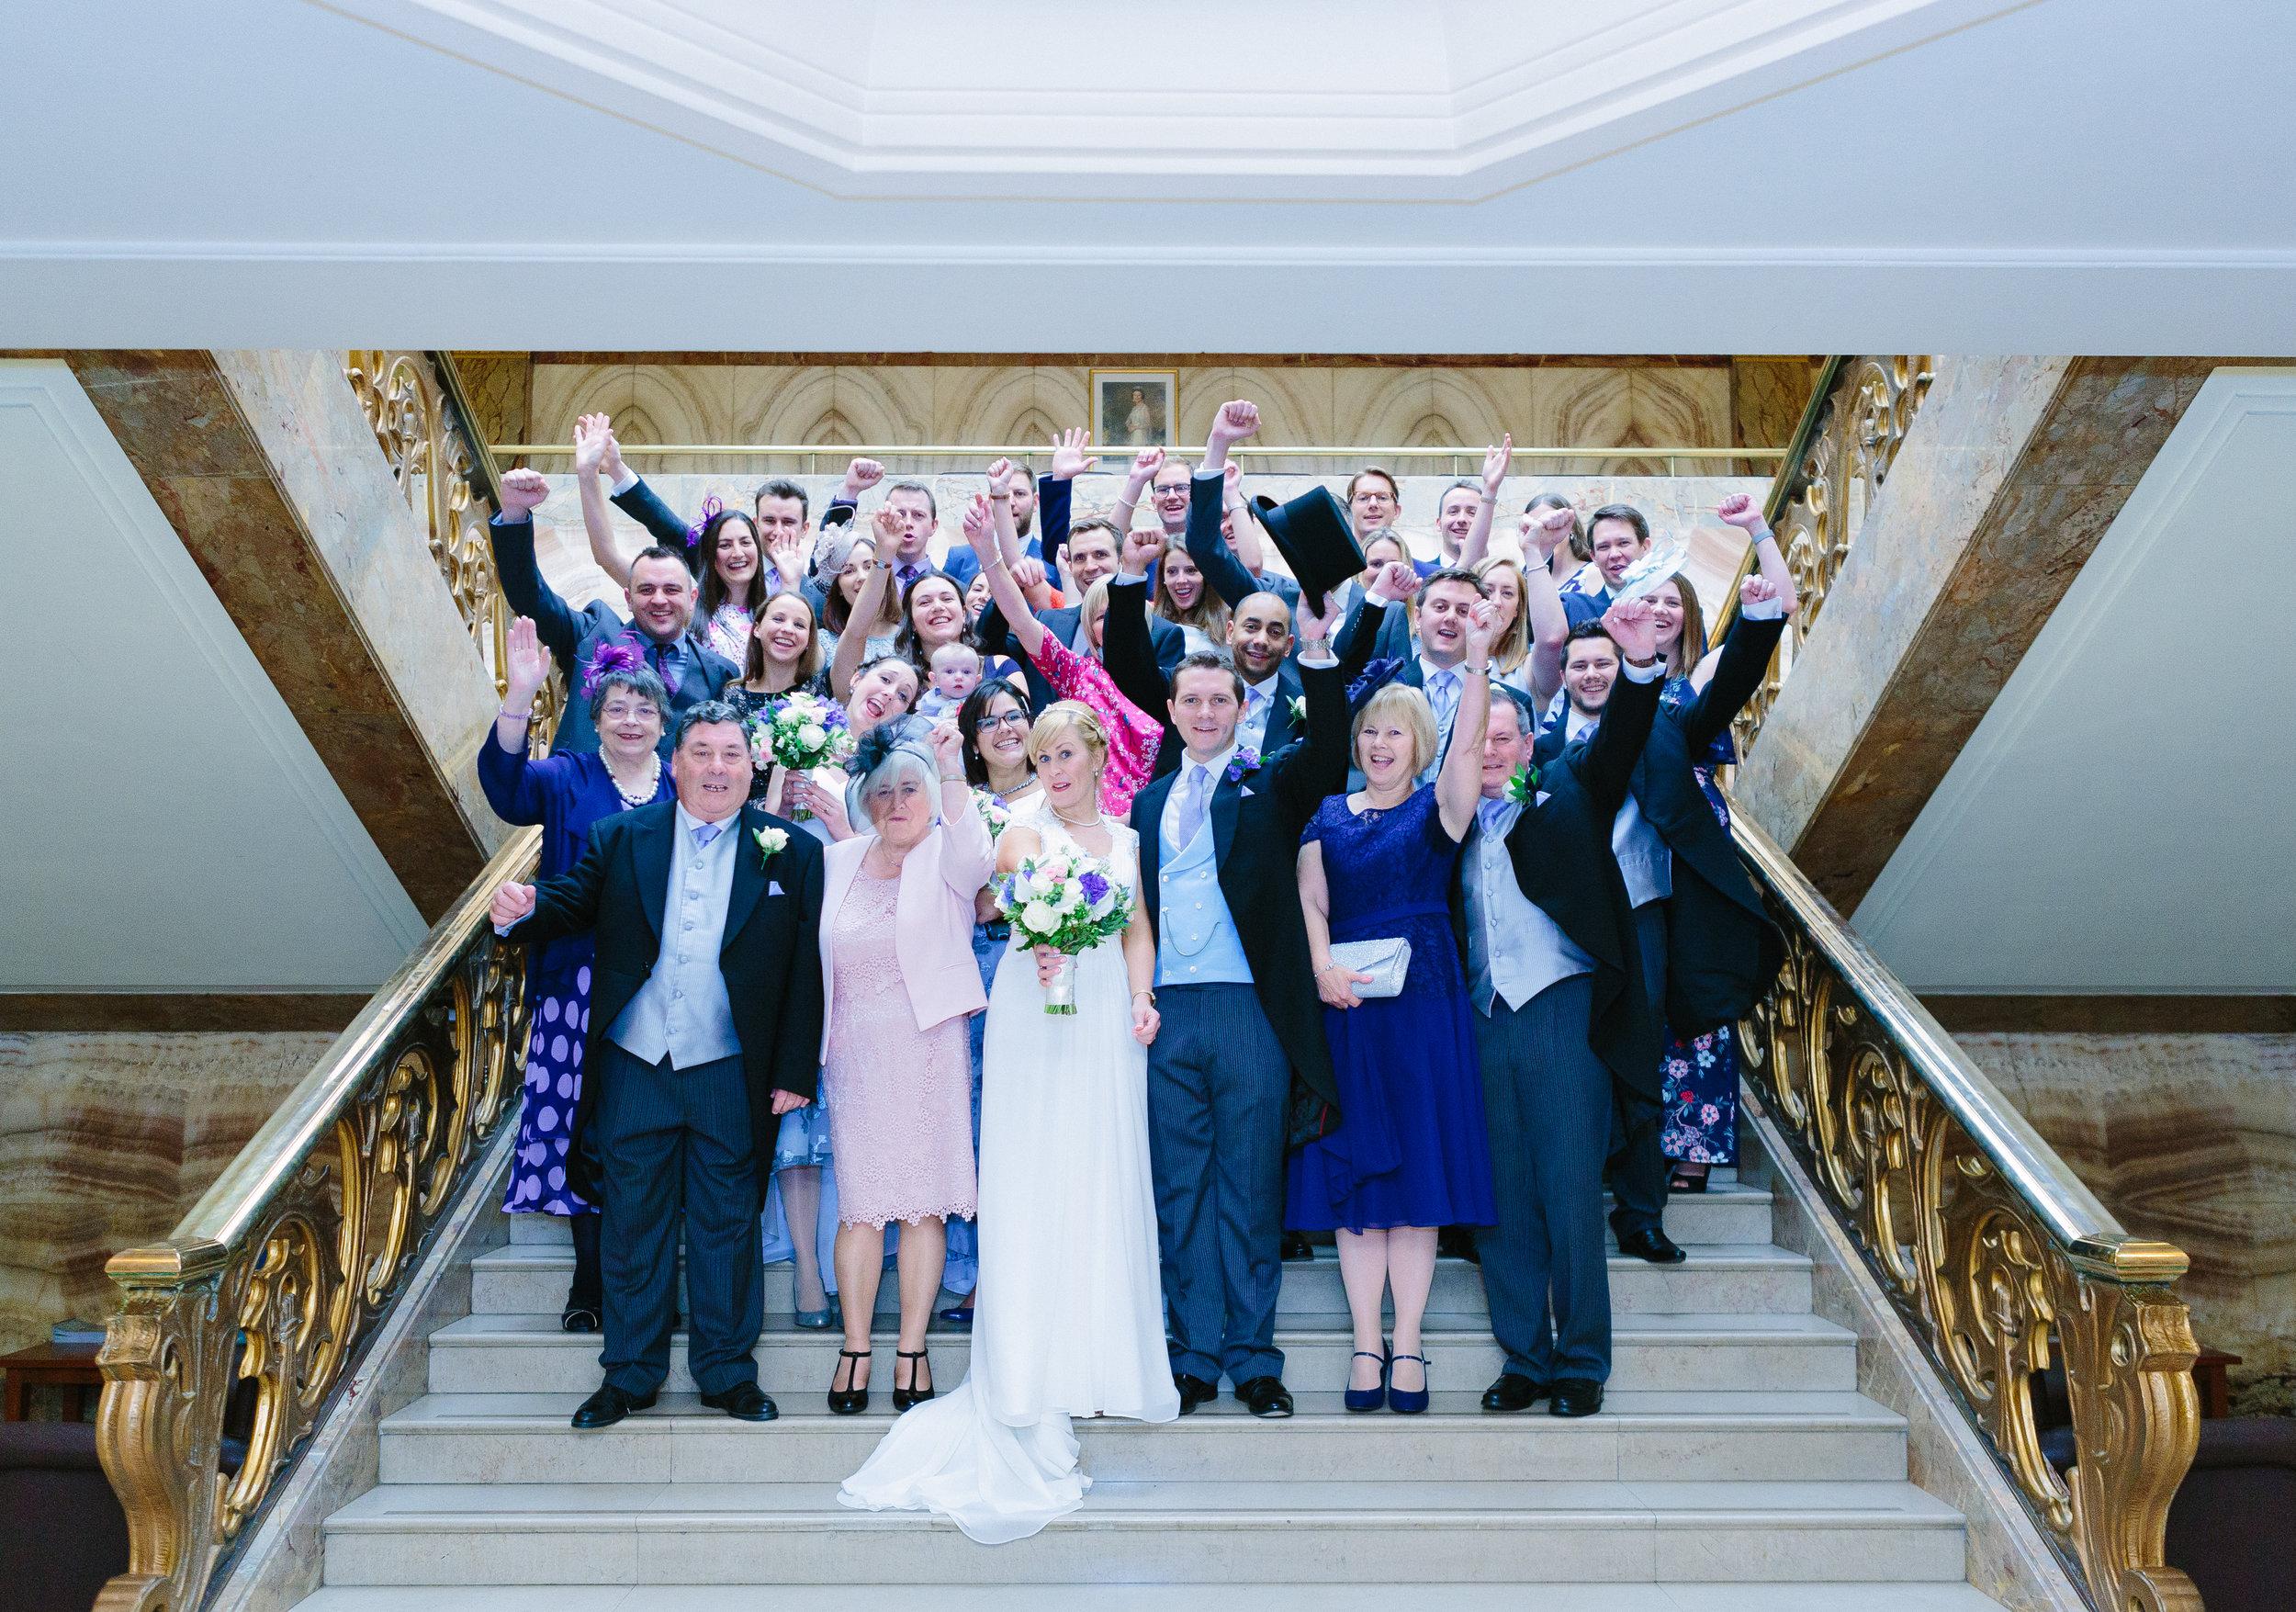 london-wedding-photography-wimbledon-wandsworth-town-hall-savoy-hotel-group-portrait-49